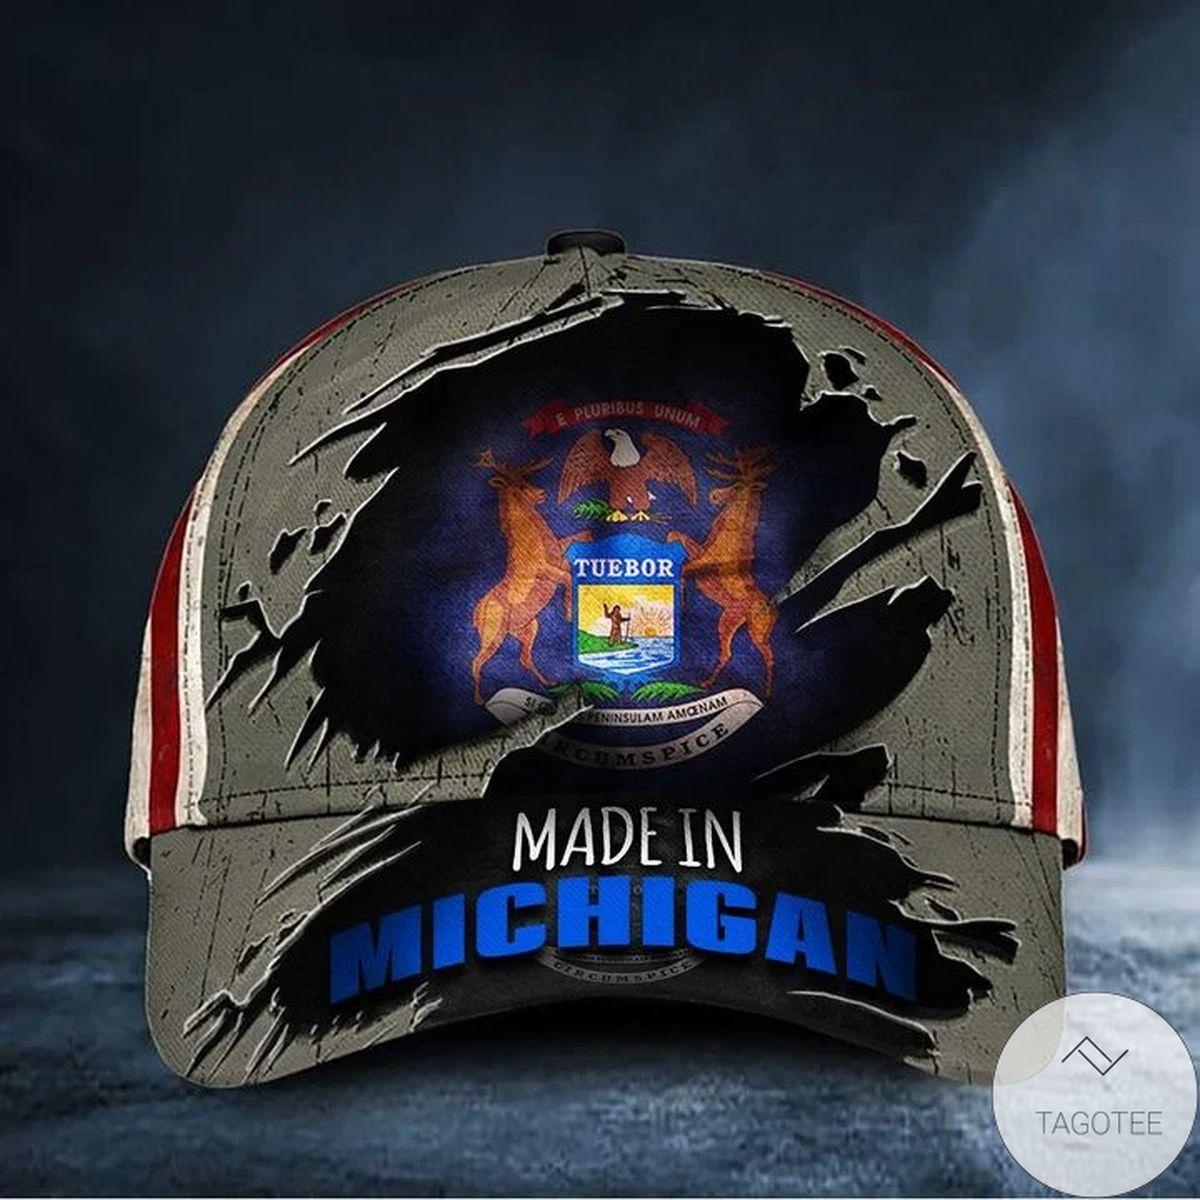 Free Ship Made In Michigan Hat Patriotic American Flag Vintage Michigan State Baseball Hat Merch